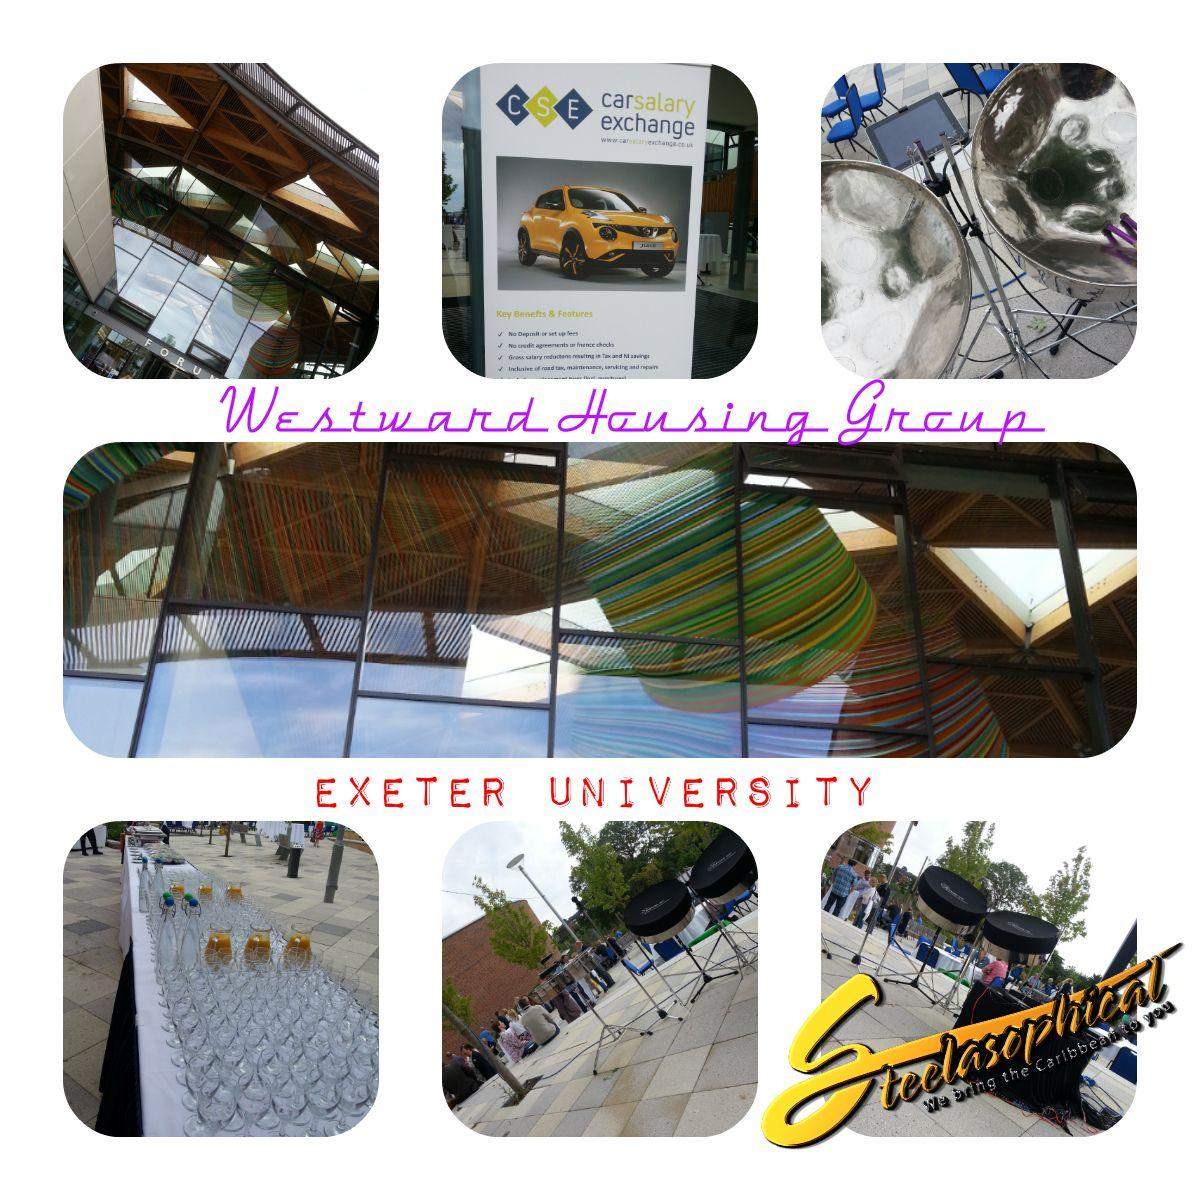 Steelband steelpan steeldrums steelasophical music hire uk exeter university